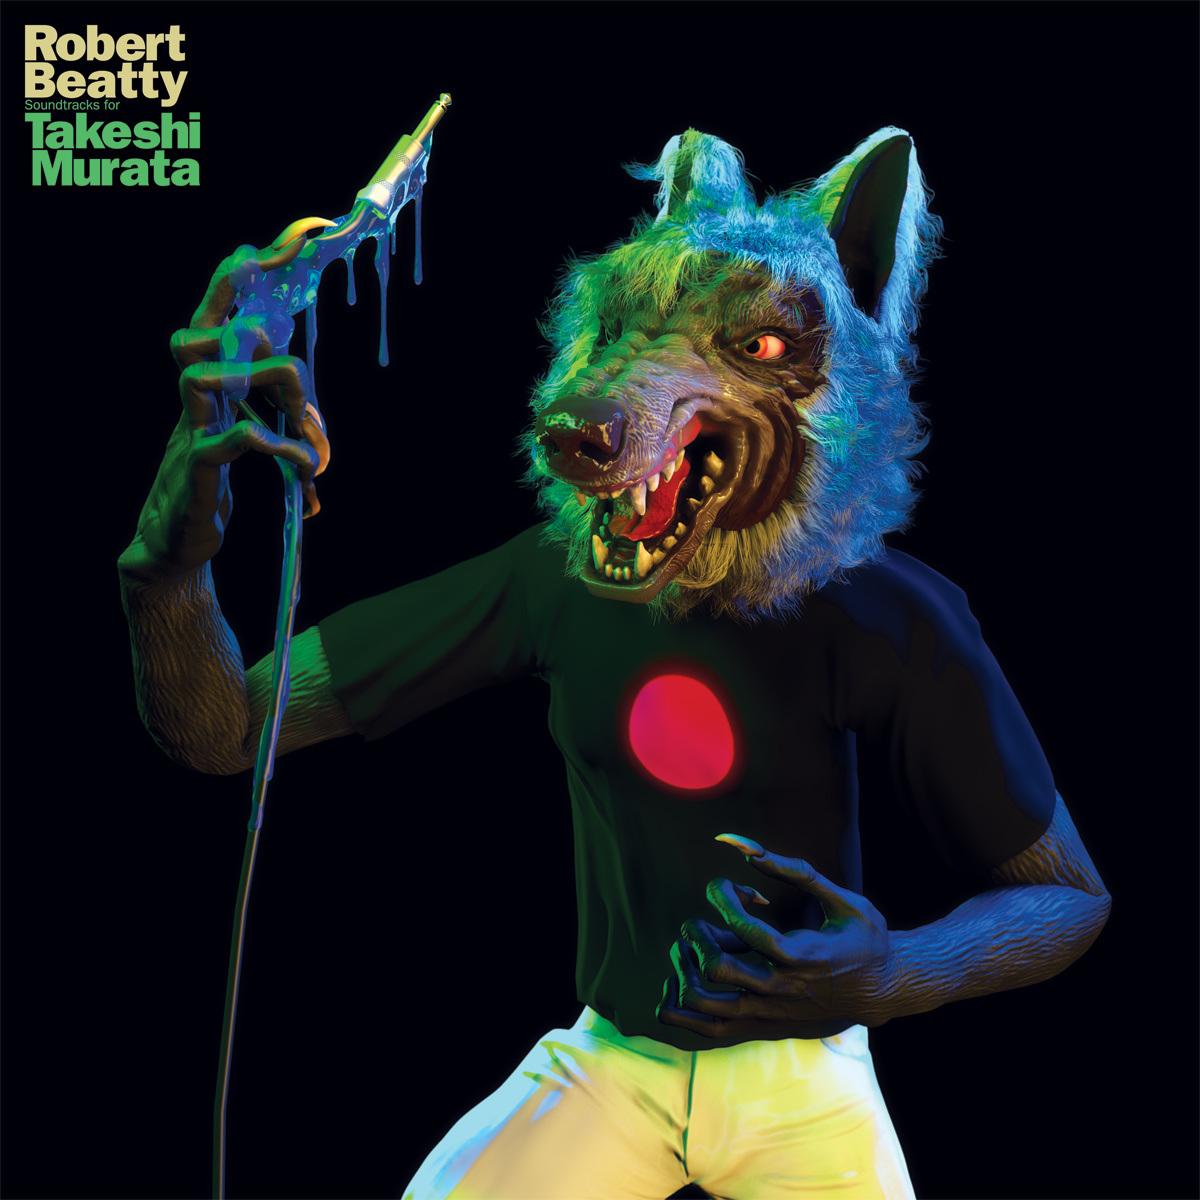 Robert Beatty - Soundtracks for Takeshi Murata